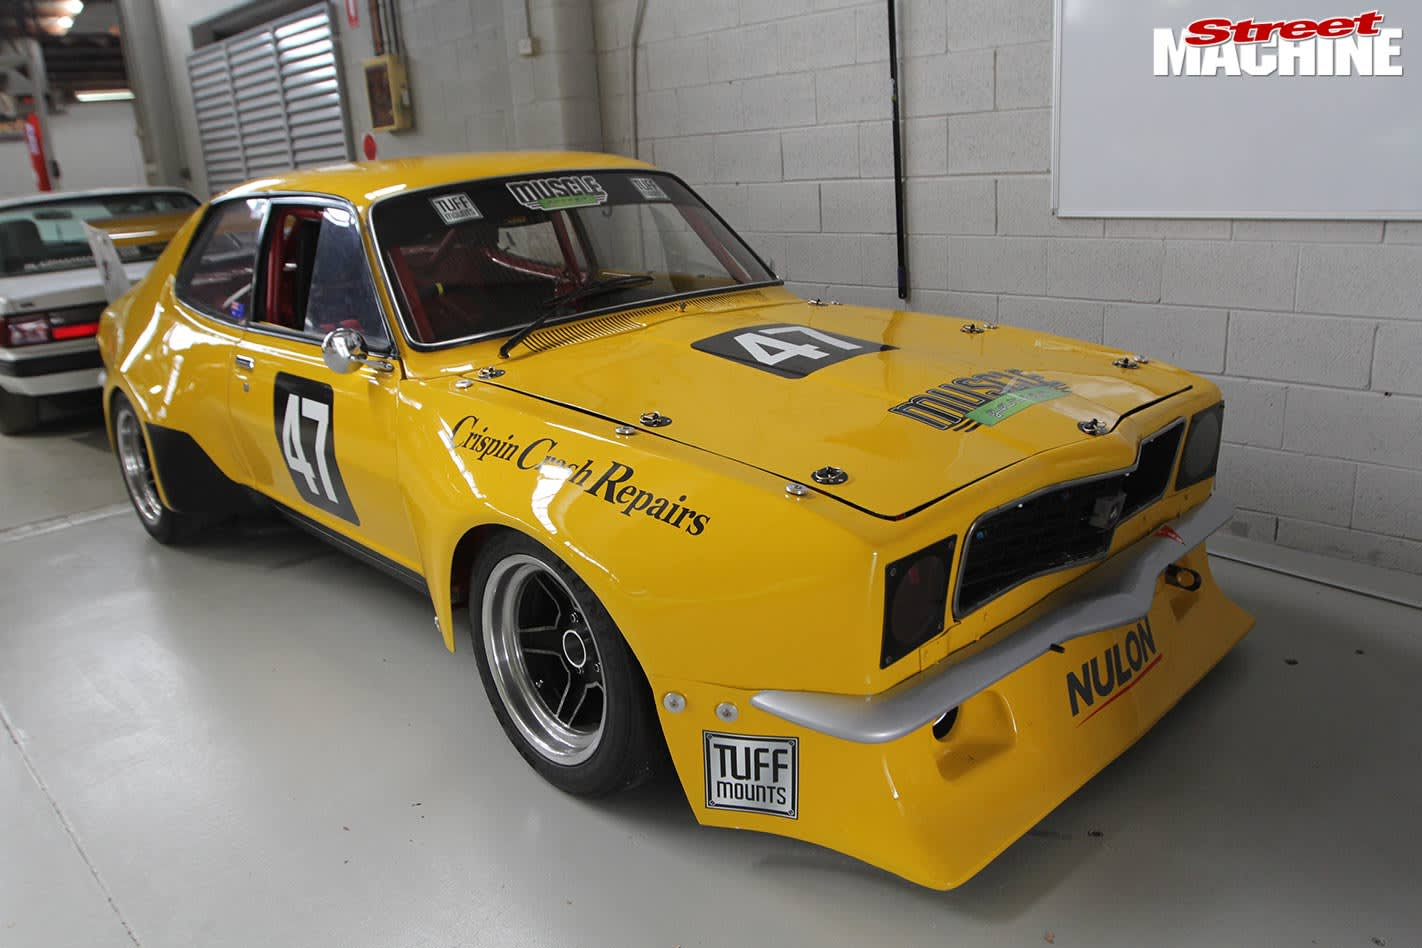 Holden LJ Torana race car